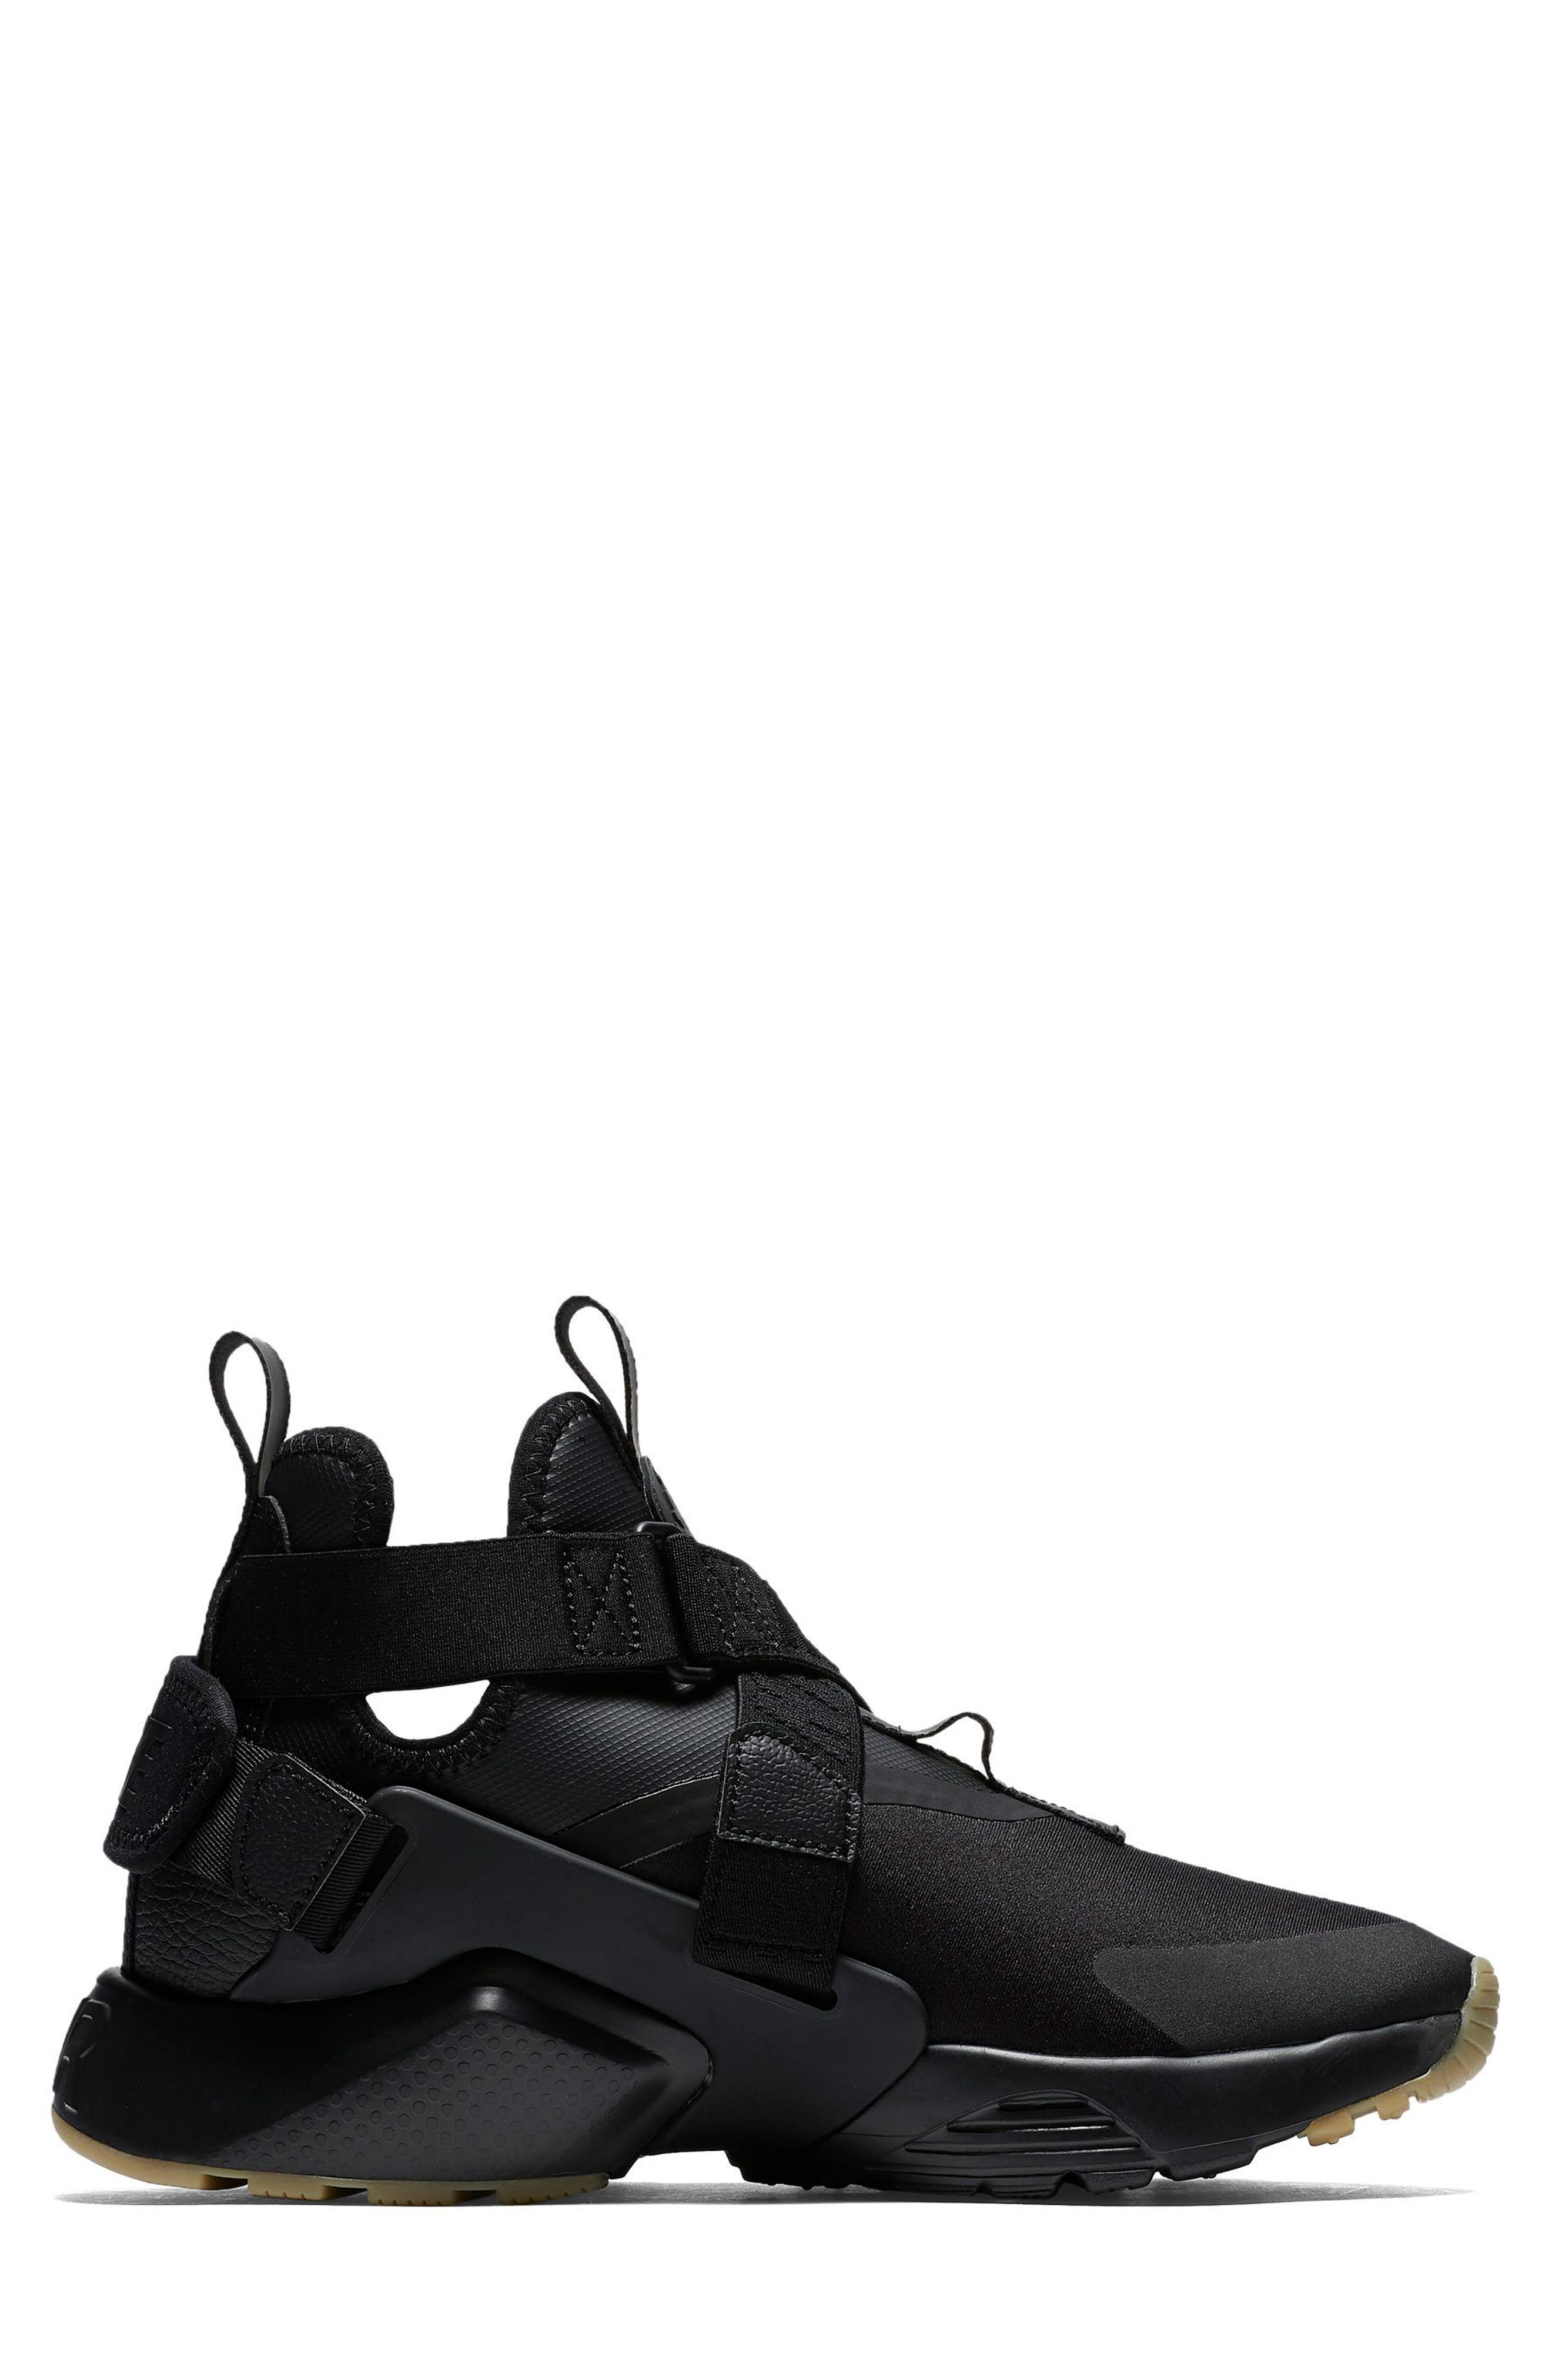 Air Huarache City Sneaker,                             Alternate thumbnail 3, color,                             BLACK/ BLACK/ DARK GREY